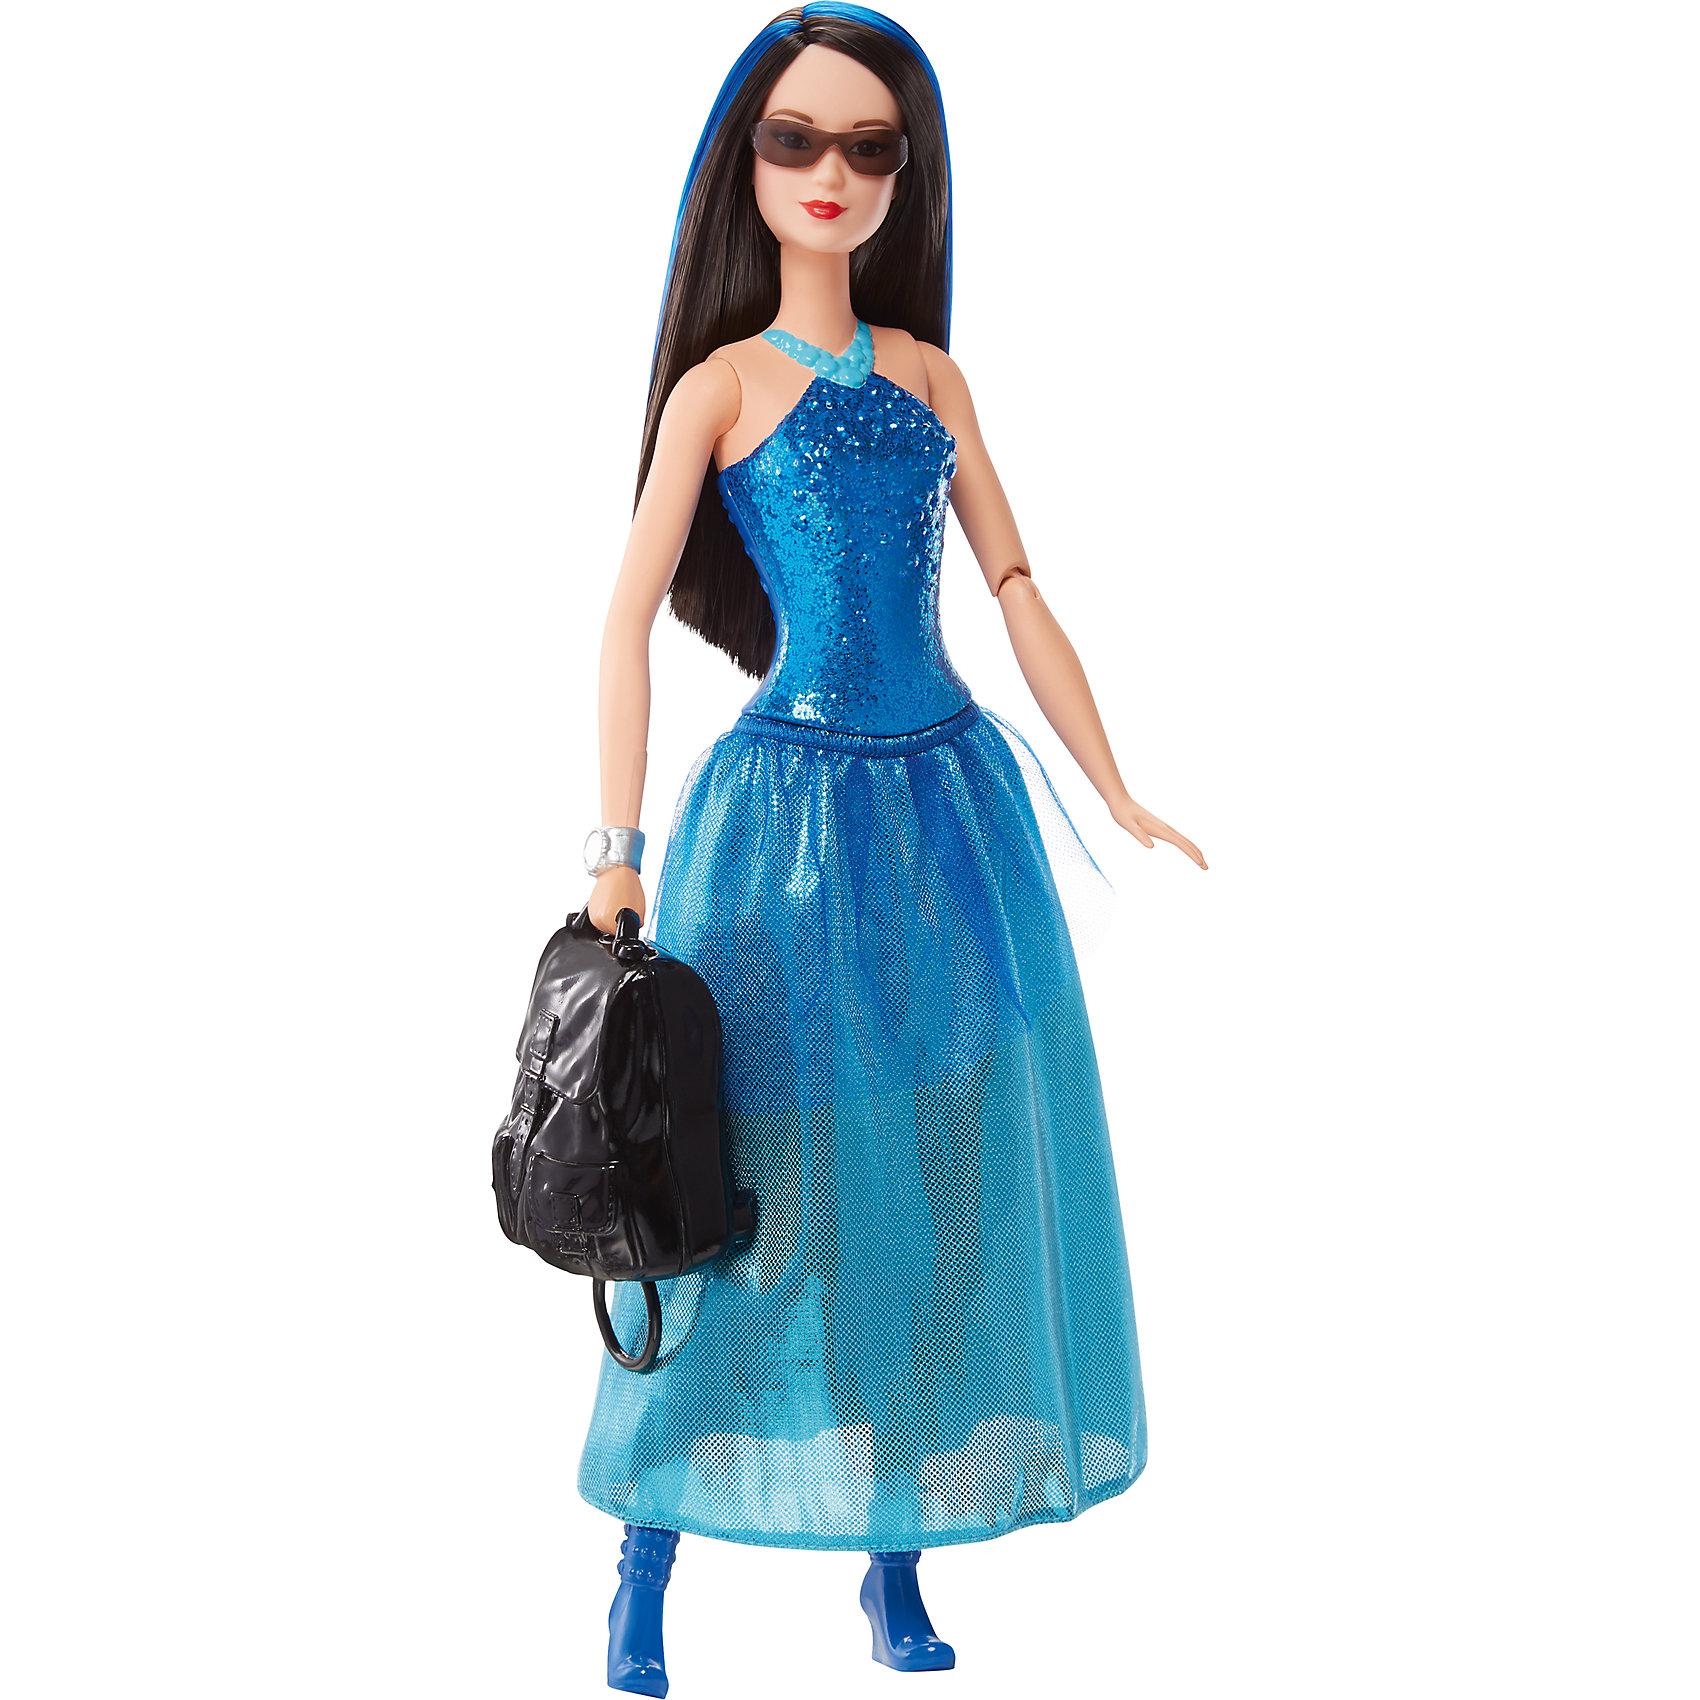 Кукла Секретный агент  Рене, Barbie